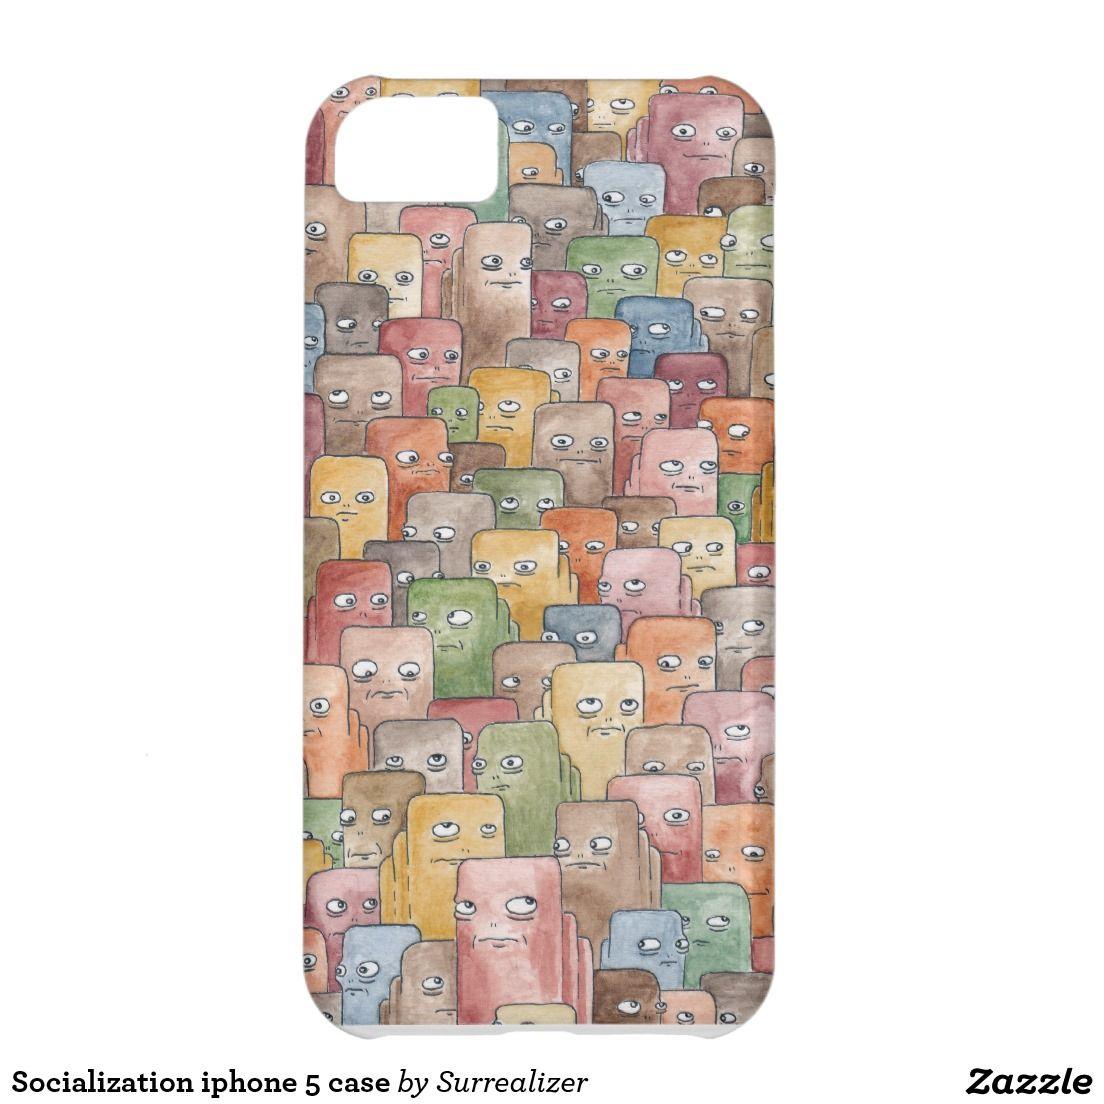 Socialization iphone 5 case